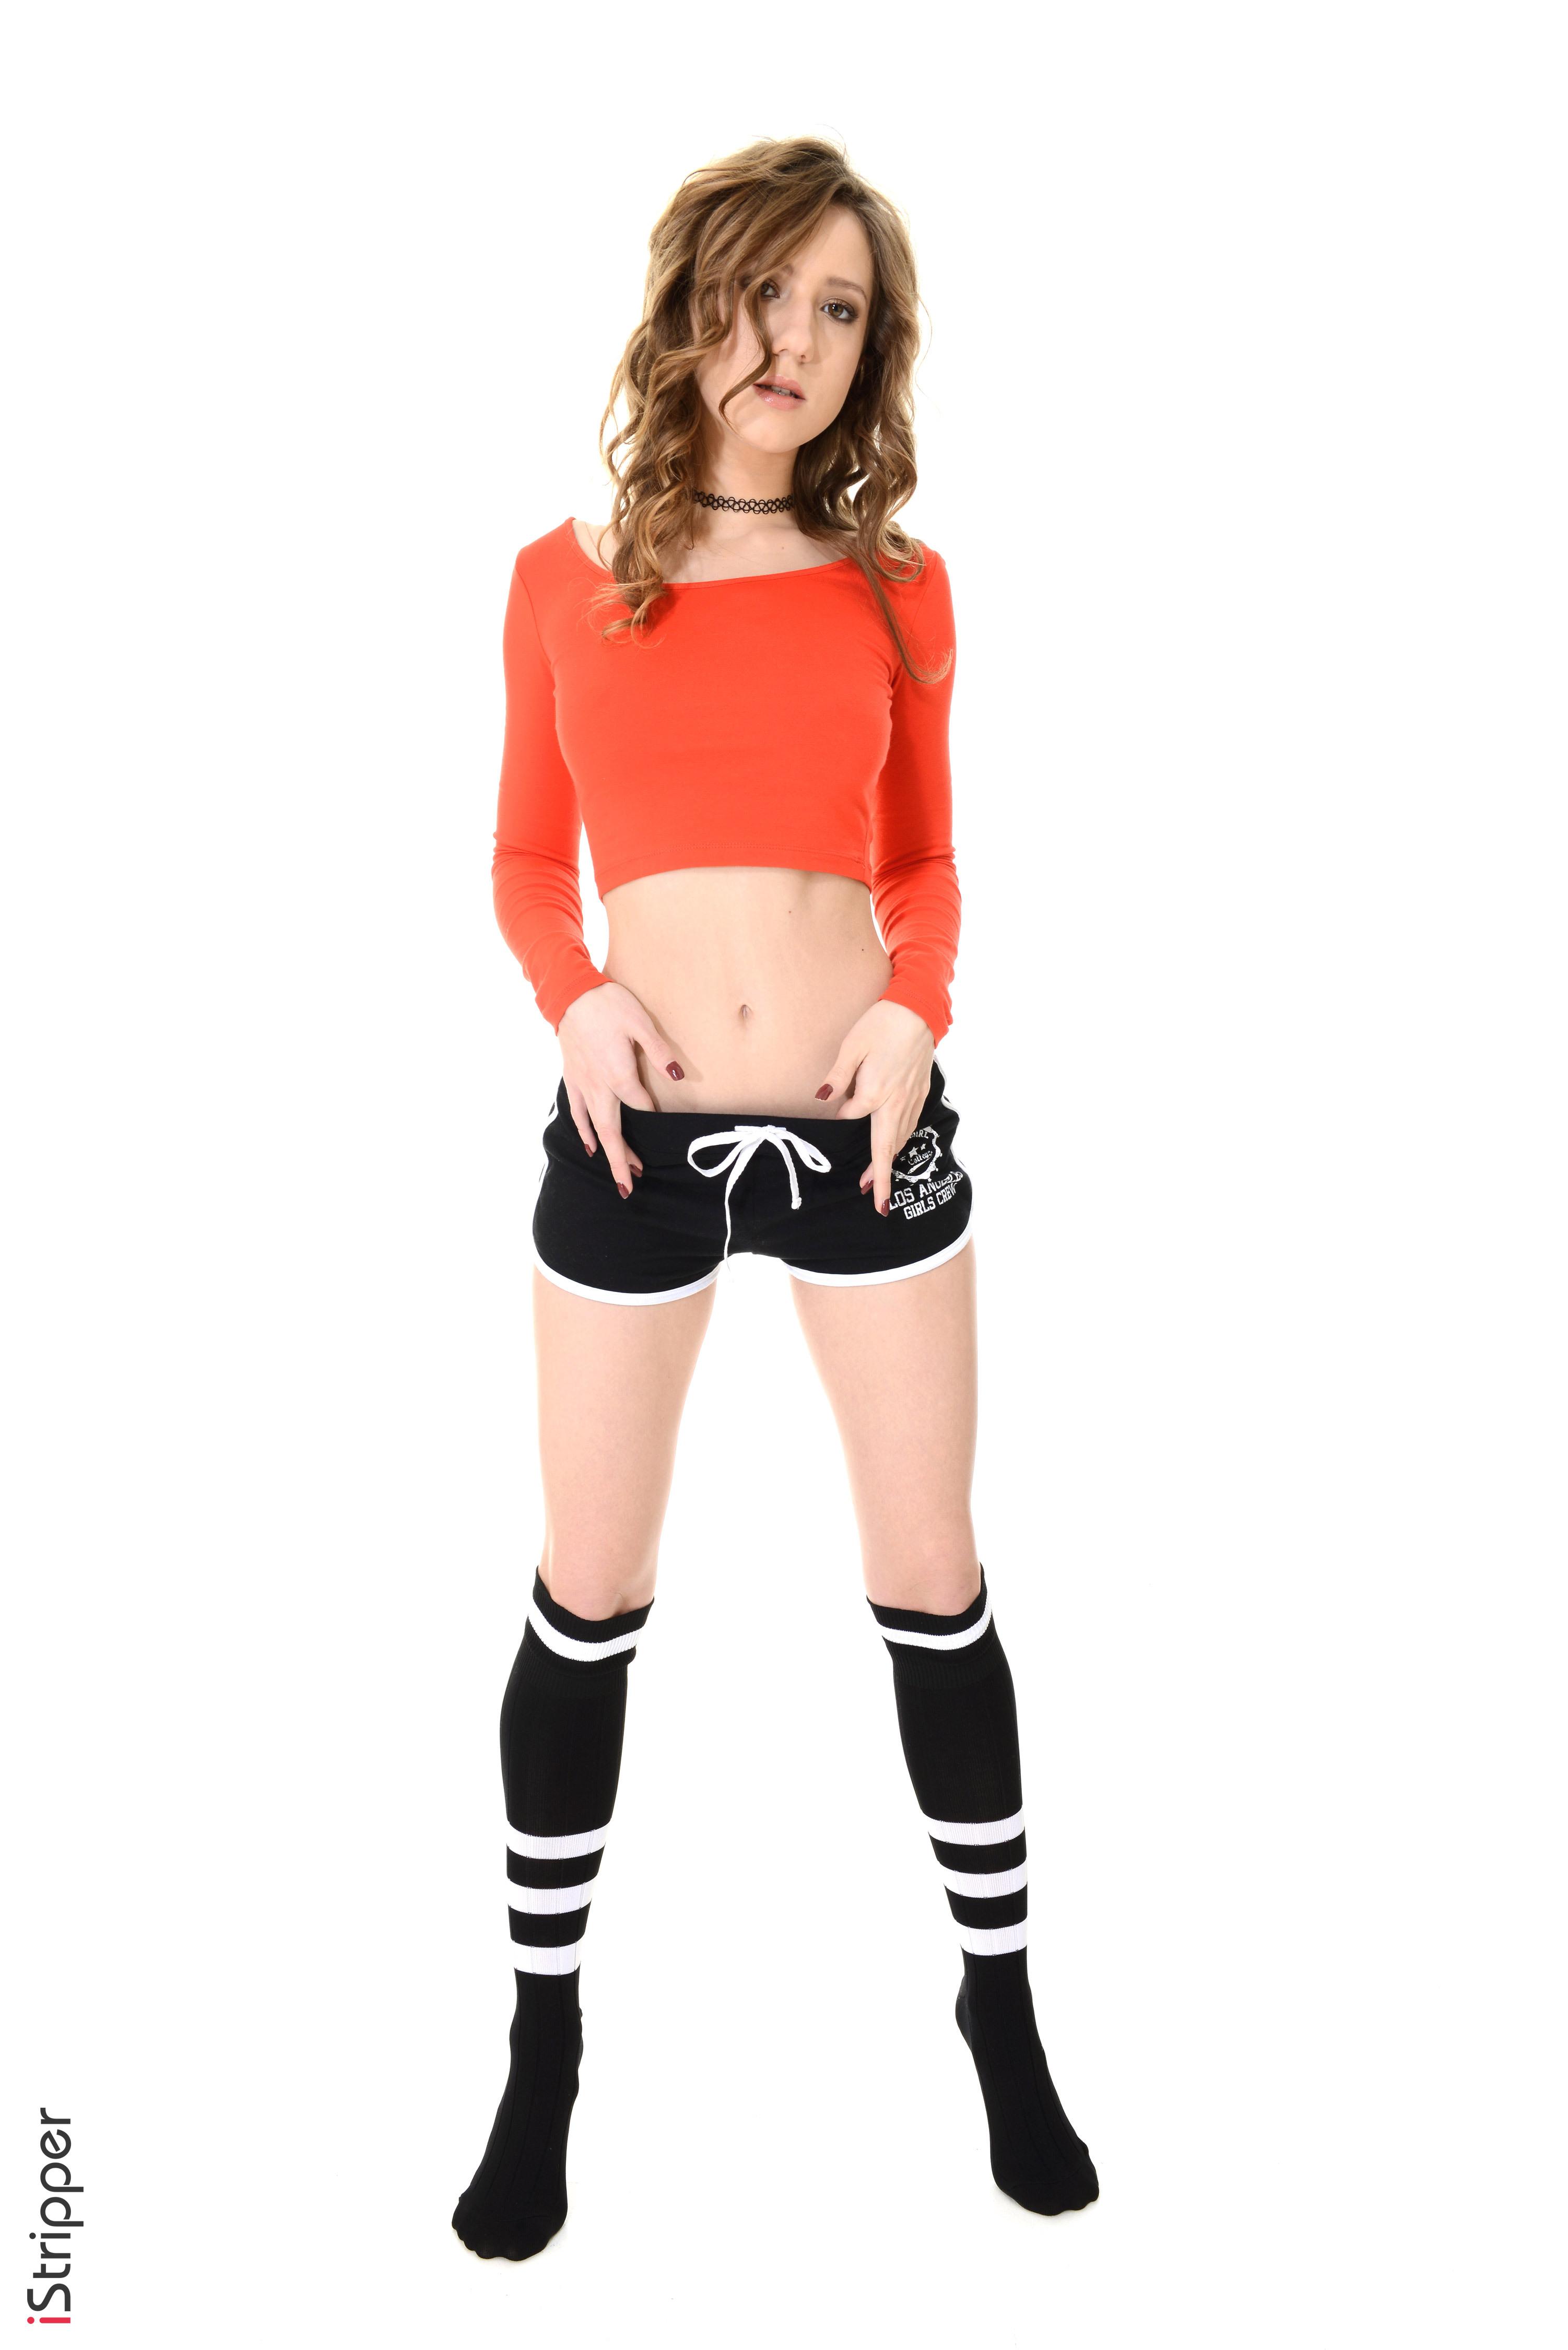 nude teen girls stripping